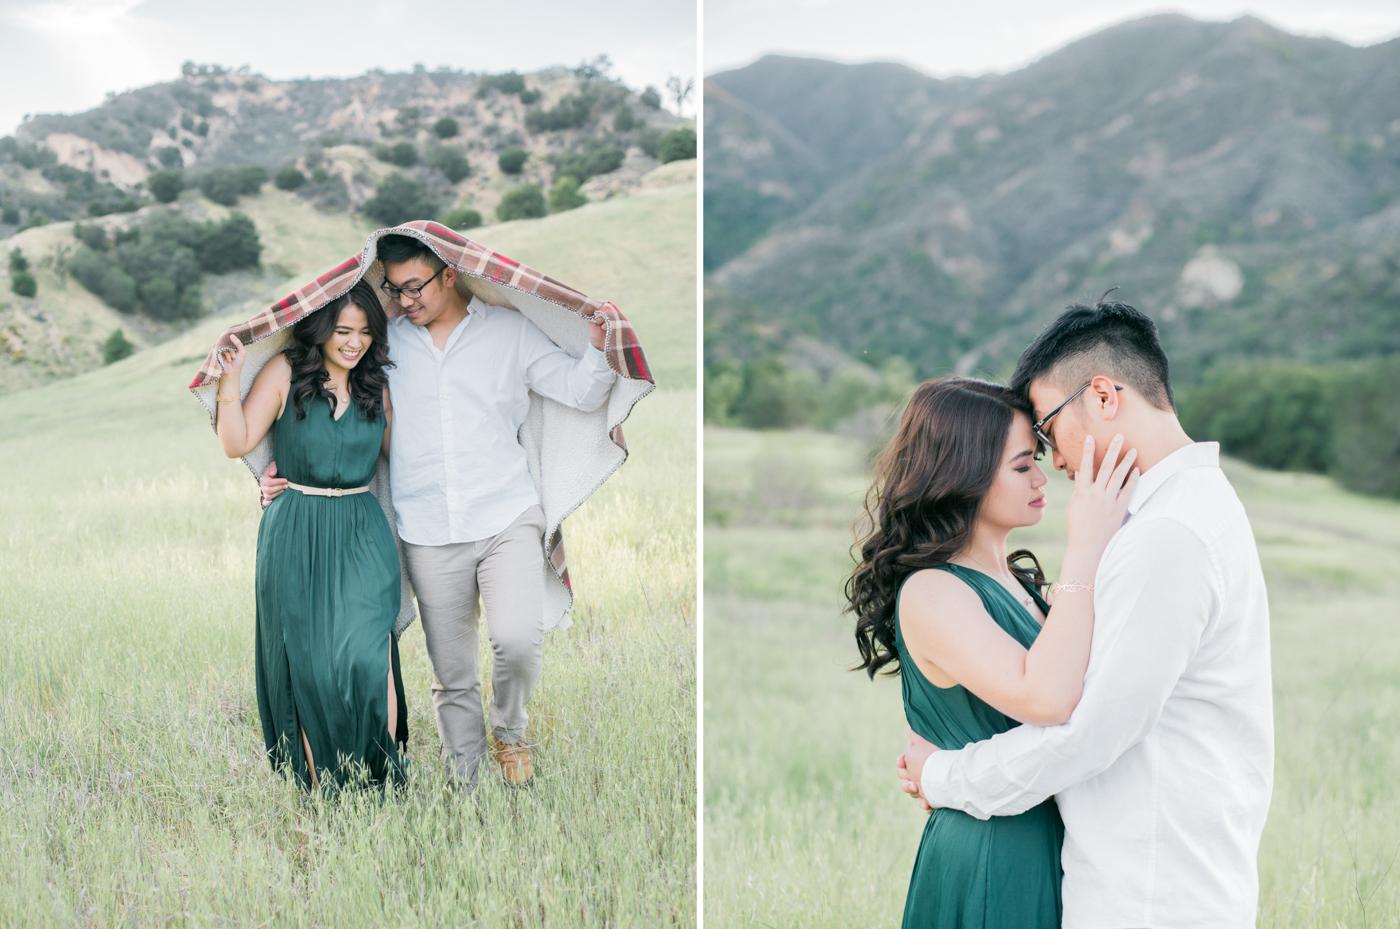 dianne&christian-malibu-creek-state-park-engagement-session-photography-los-angeles-based-wedding-photographer-5.jpg